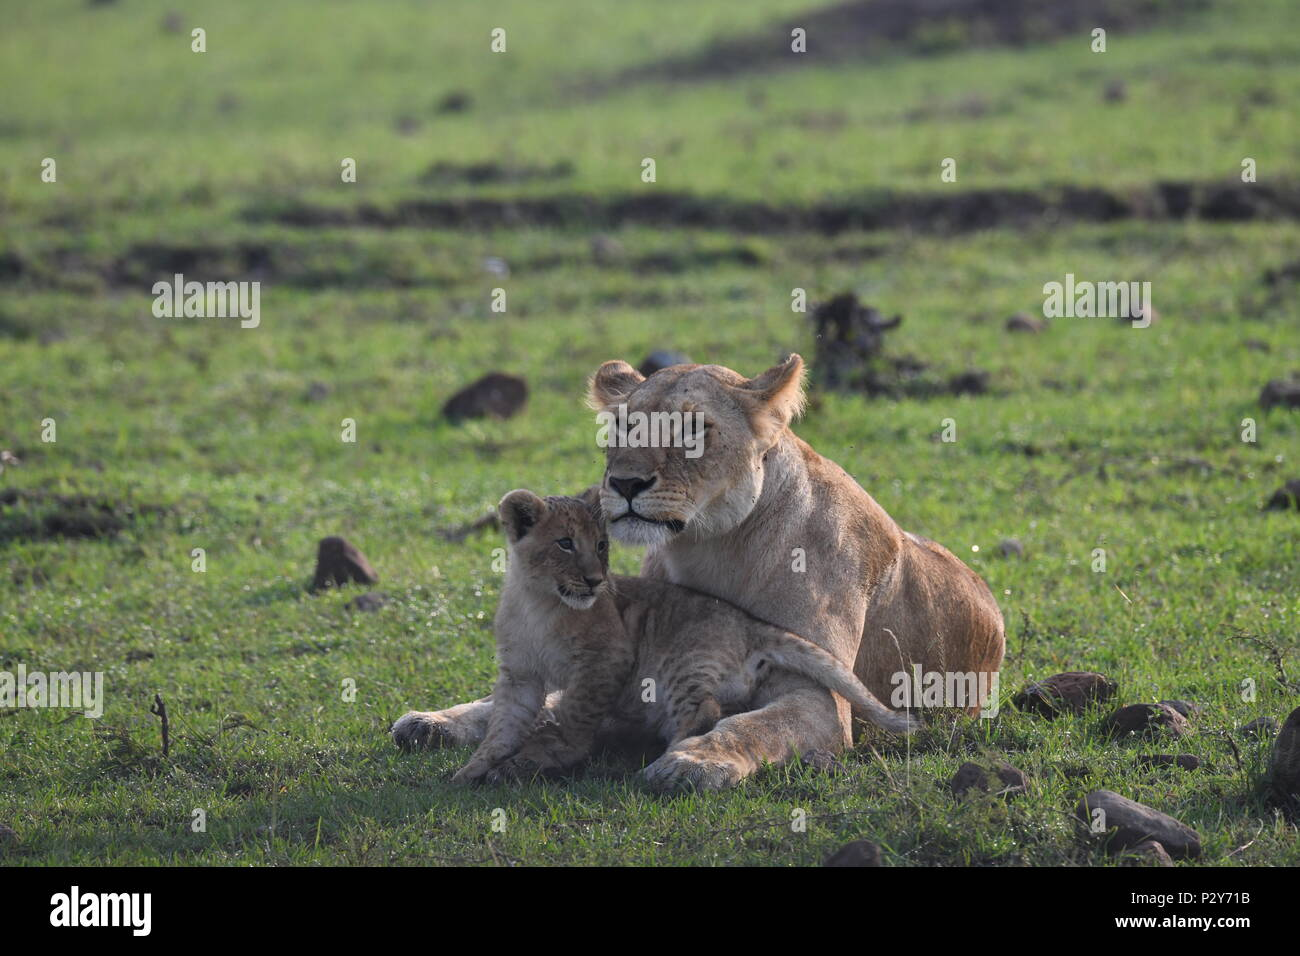 Lioness and cub resting on the Maasai Mara plains (Panthera leo). Kenyan Safari, picture taken in the Olare Motorogi Conservancy. Stock Photo